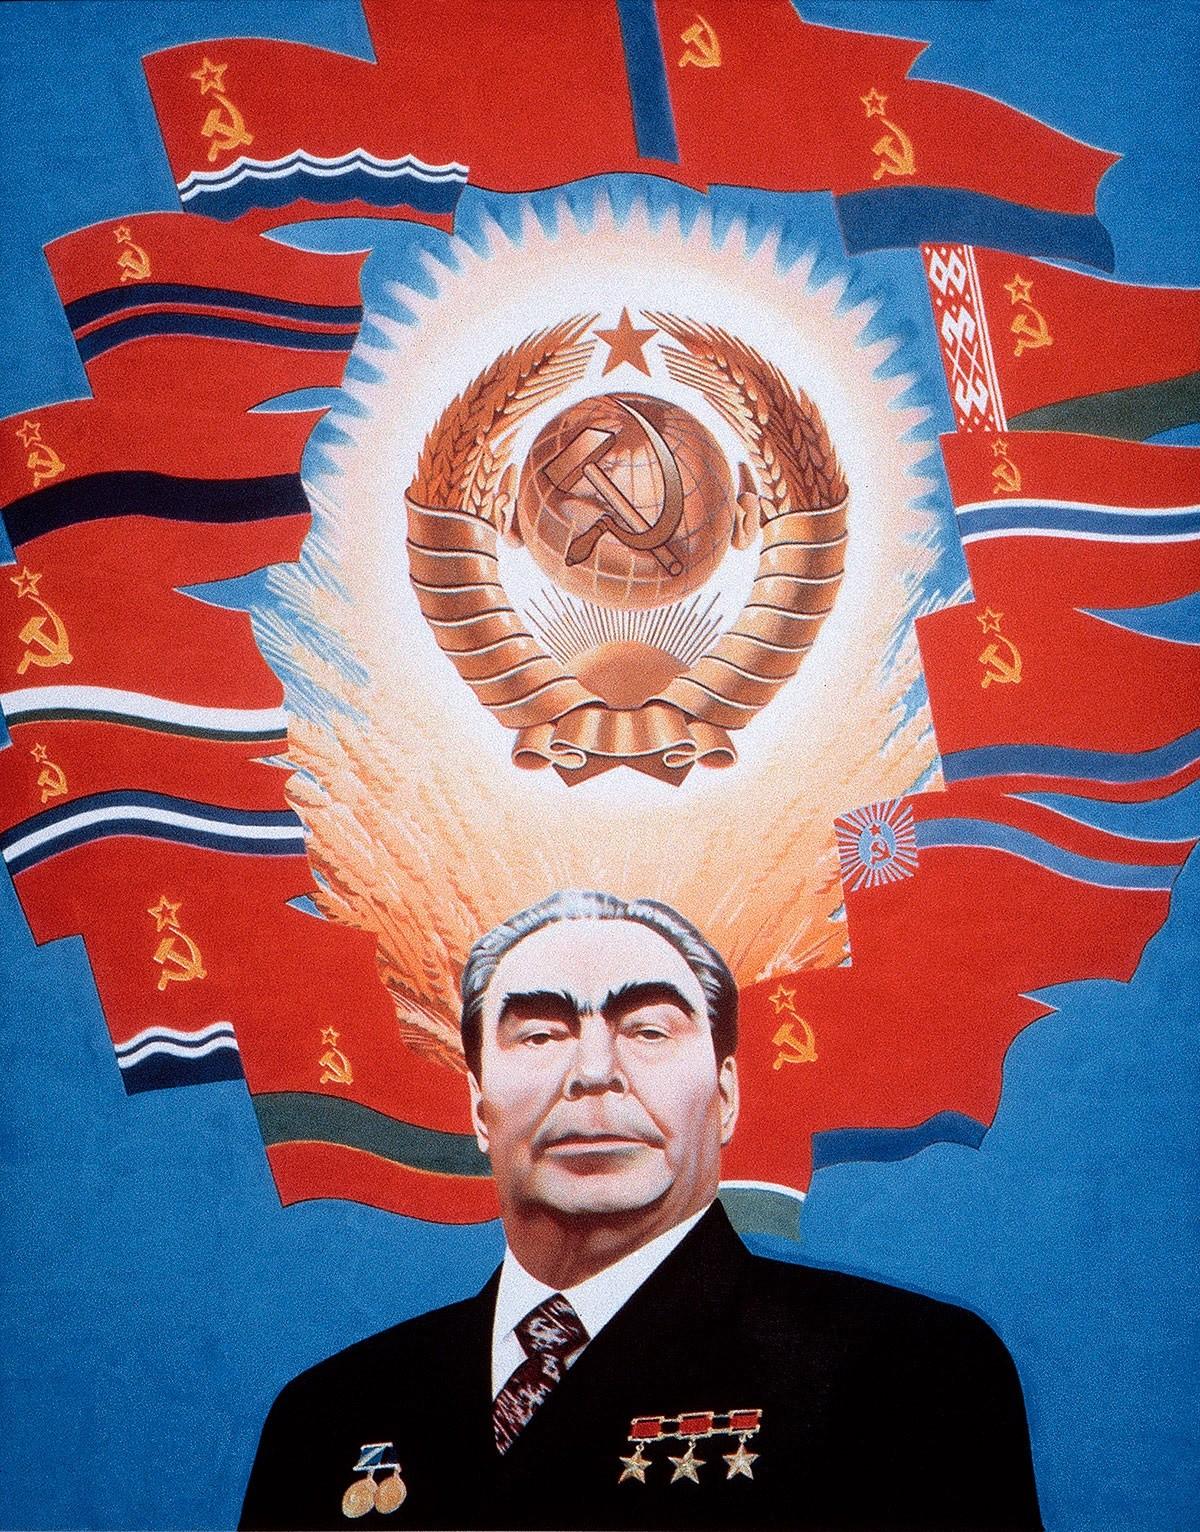 Eric Bulatov. Brezhnev. Soviet Space, 1977